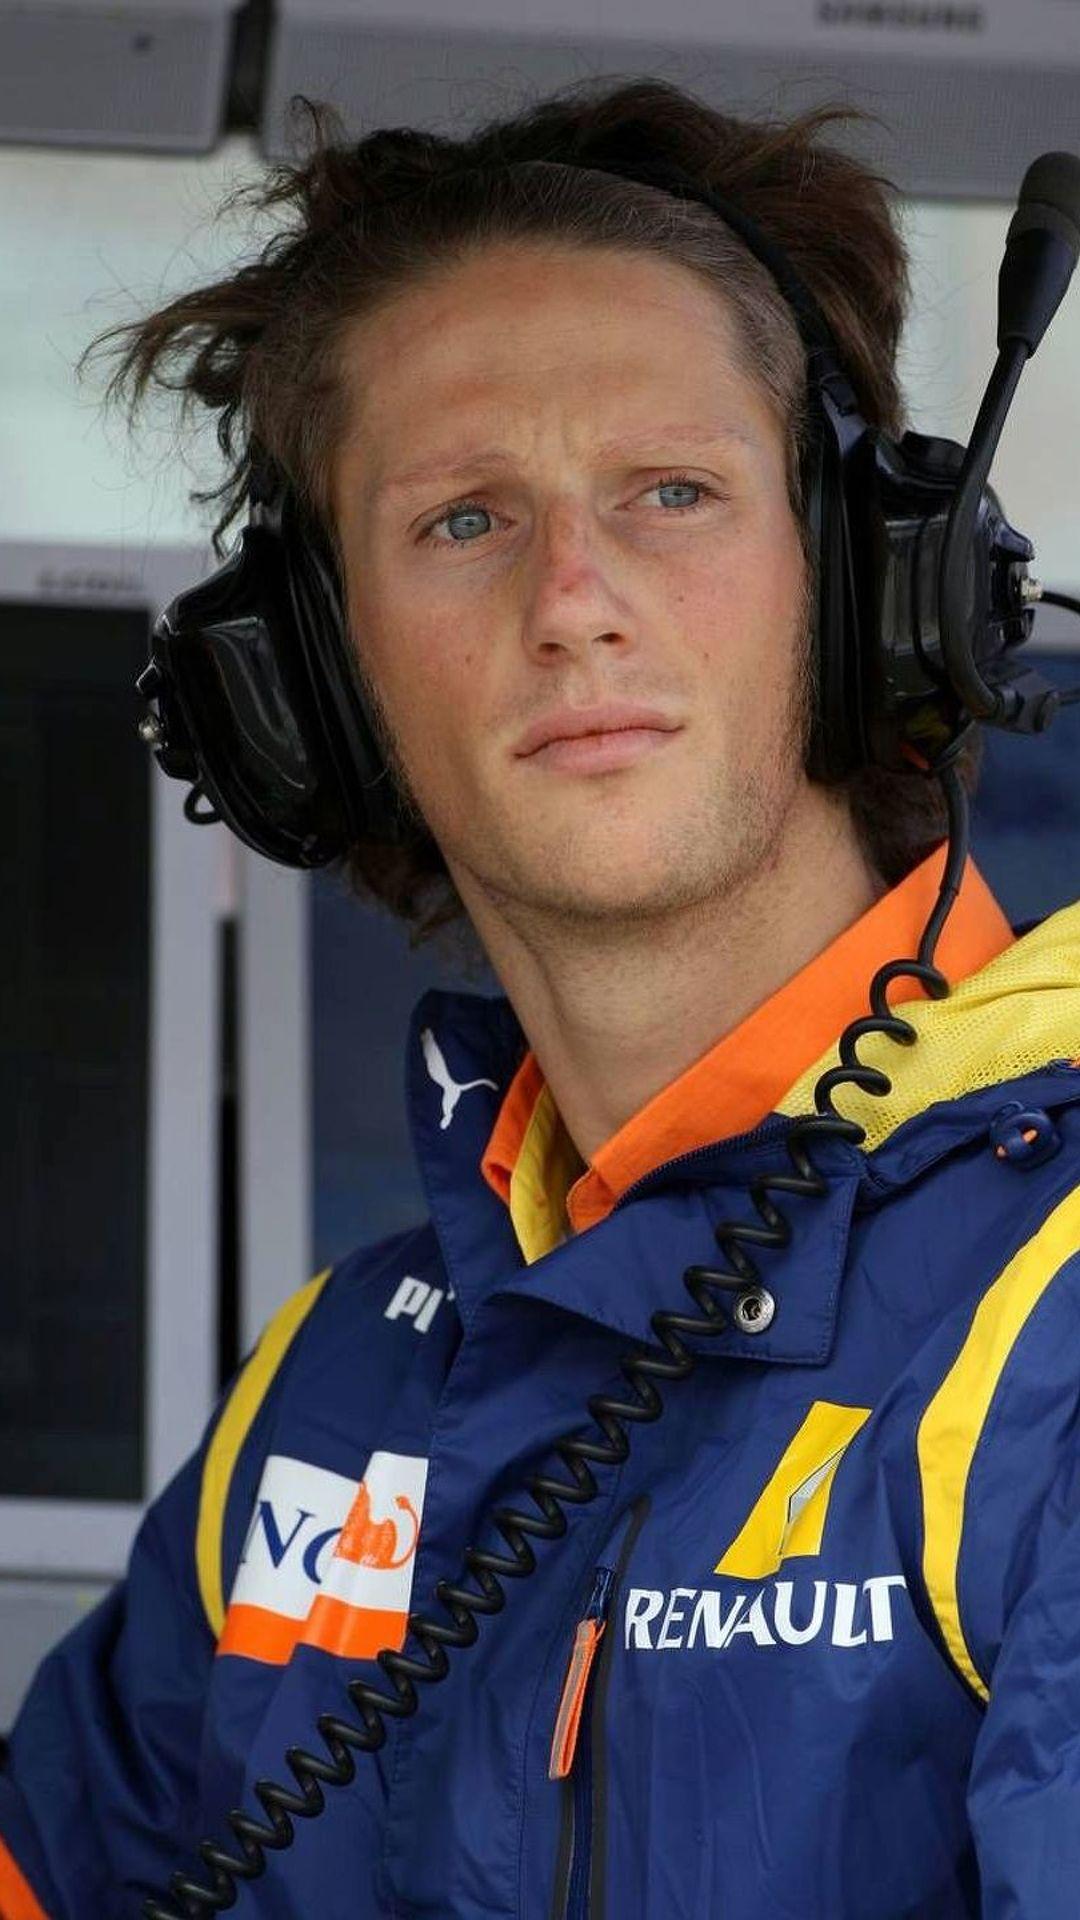 Grosjean/Renault announcement imminent